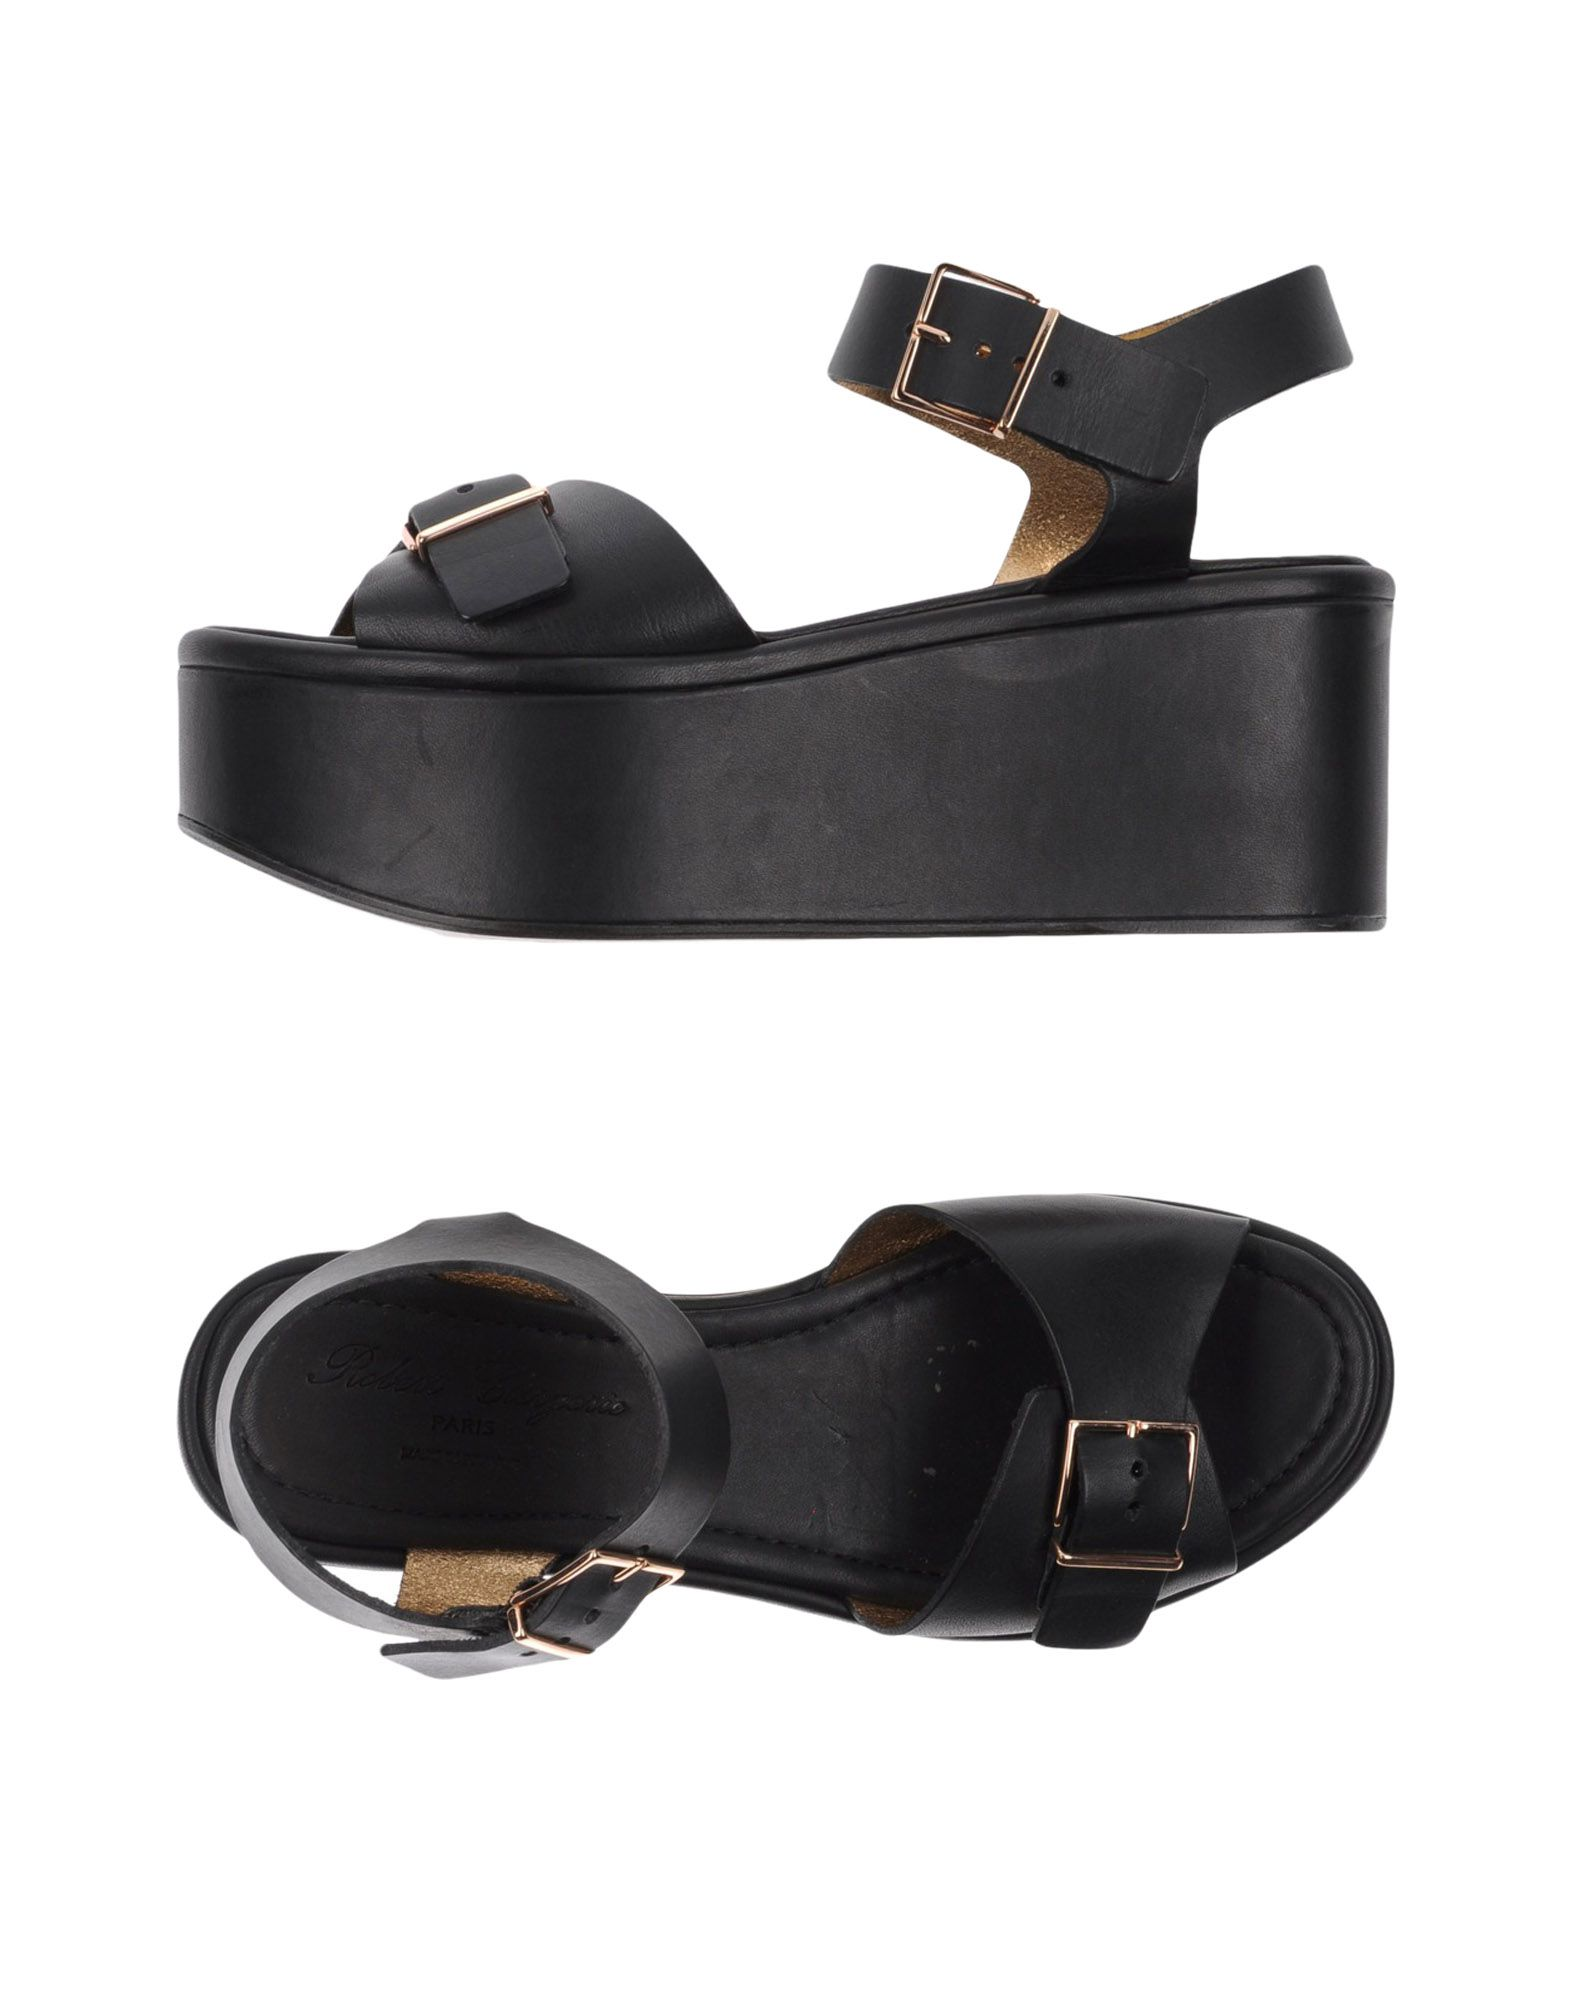 Robert Clergerie Sandals - on Women Robert Clergerie Sandals online on -  Australia - 11356770JQ 06230c